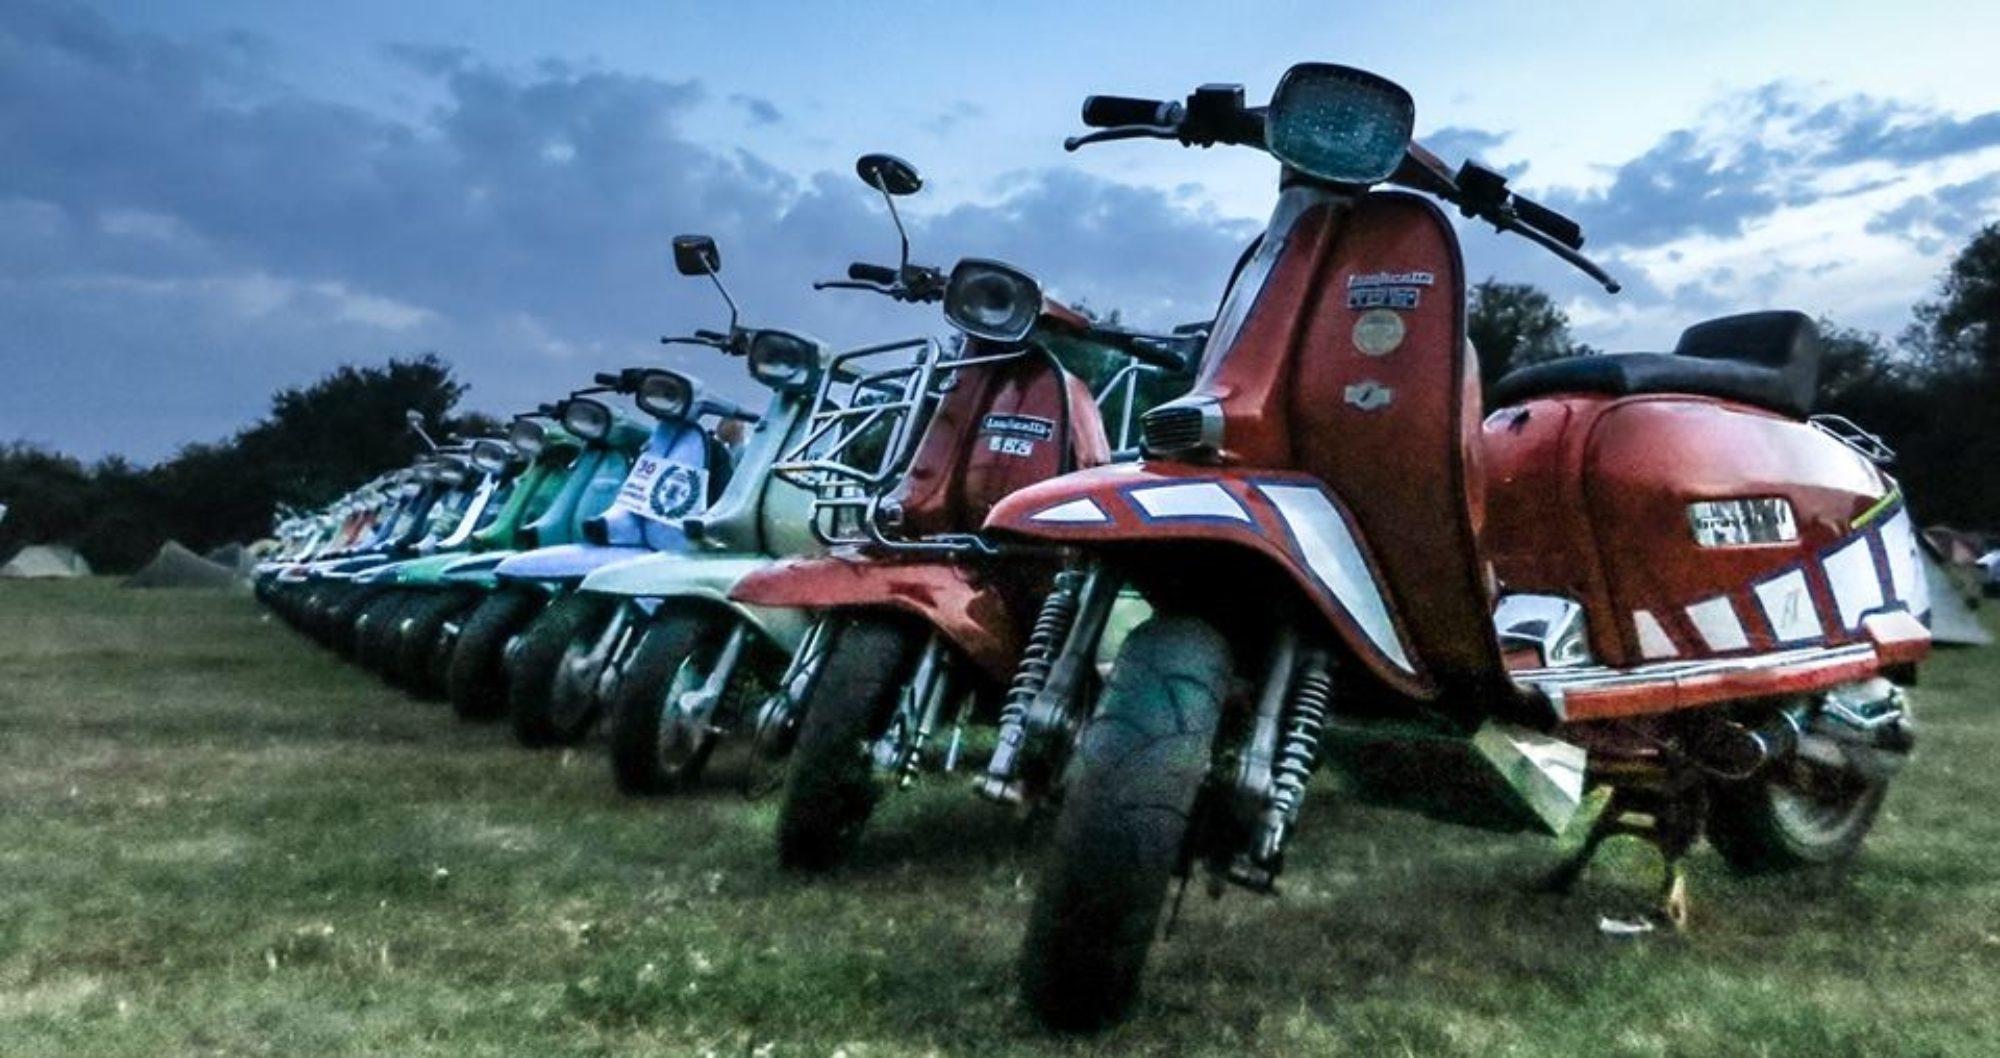 Lambretta Images Archive